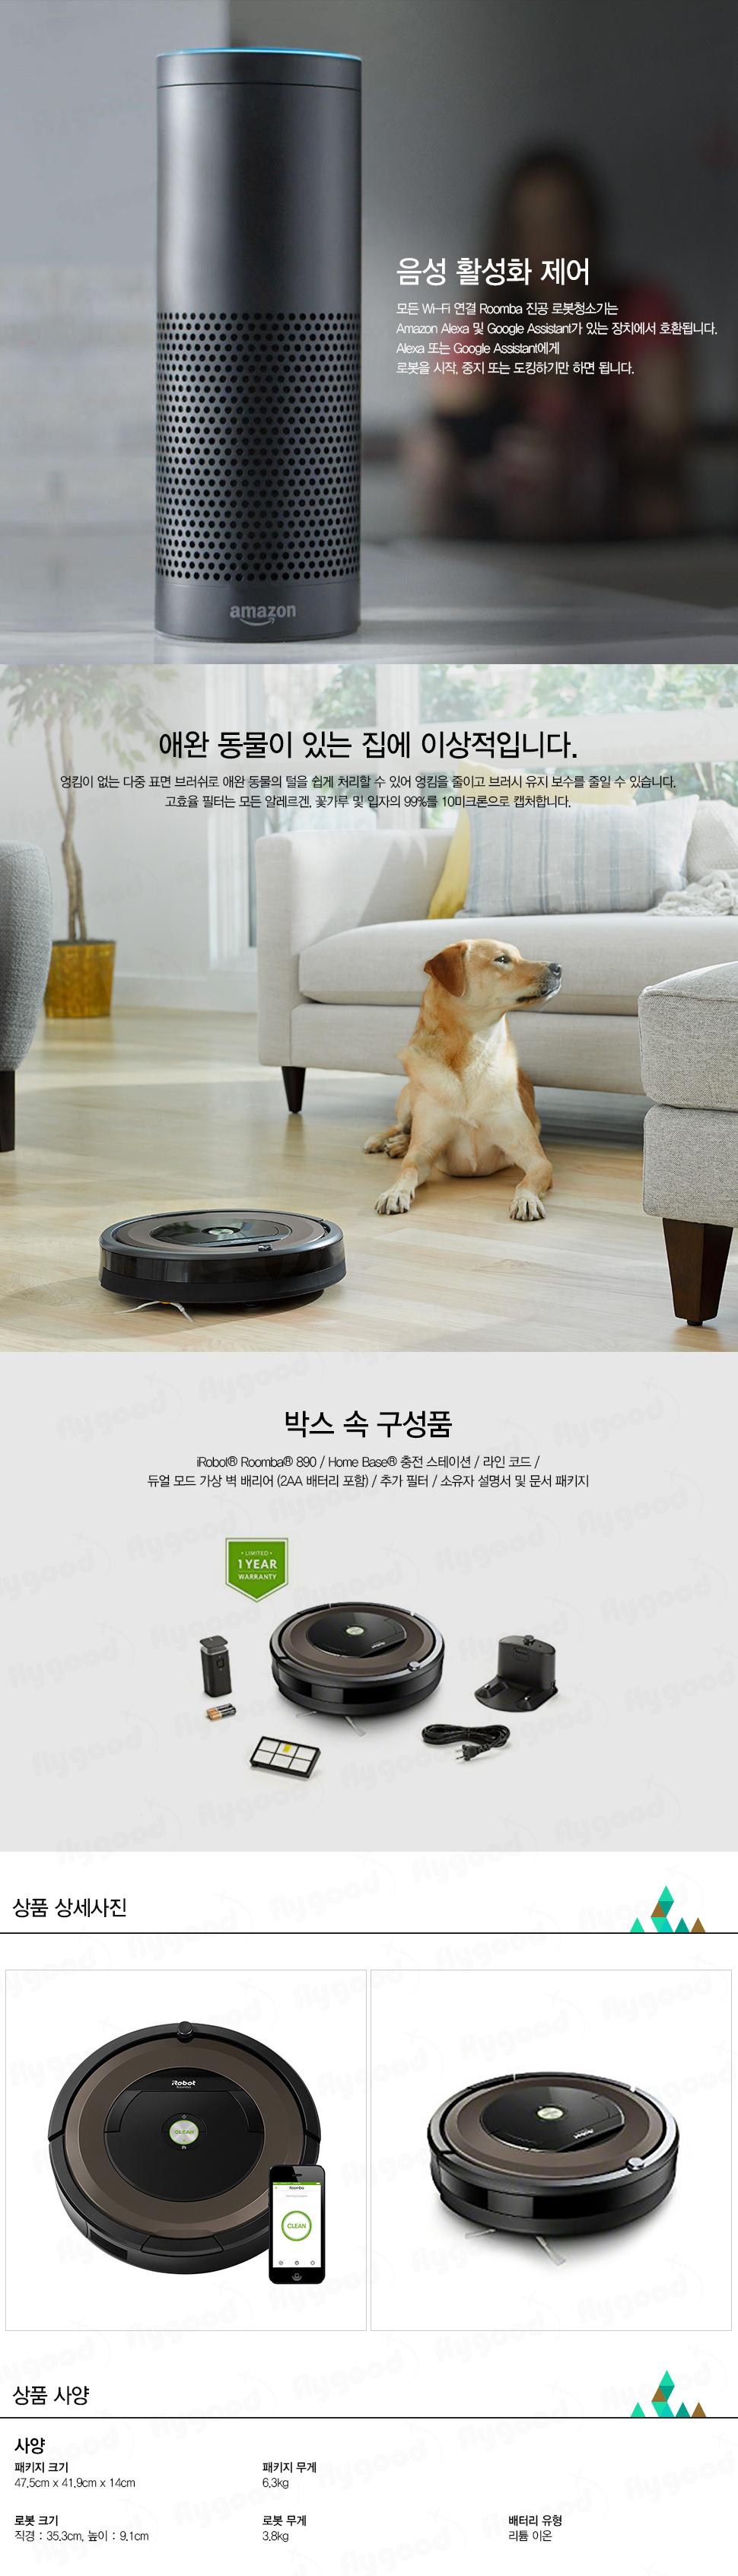 iRobot_Roomba_890_03.jpg